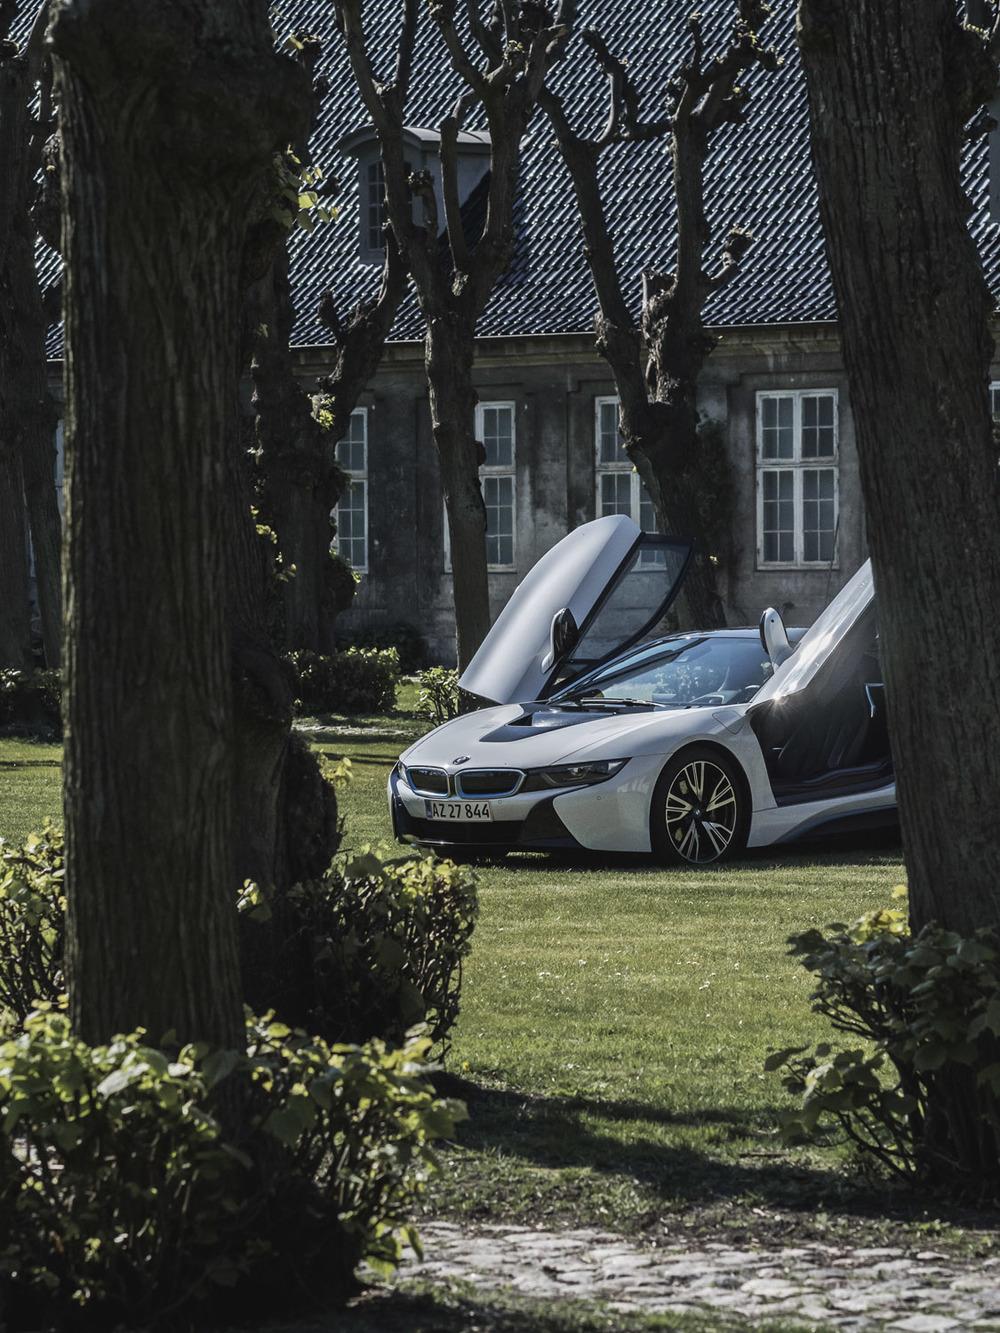 BMW i8..... dam a cool car